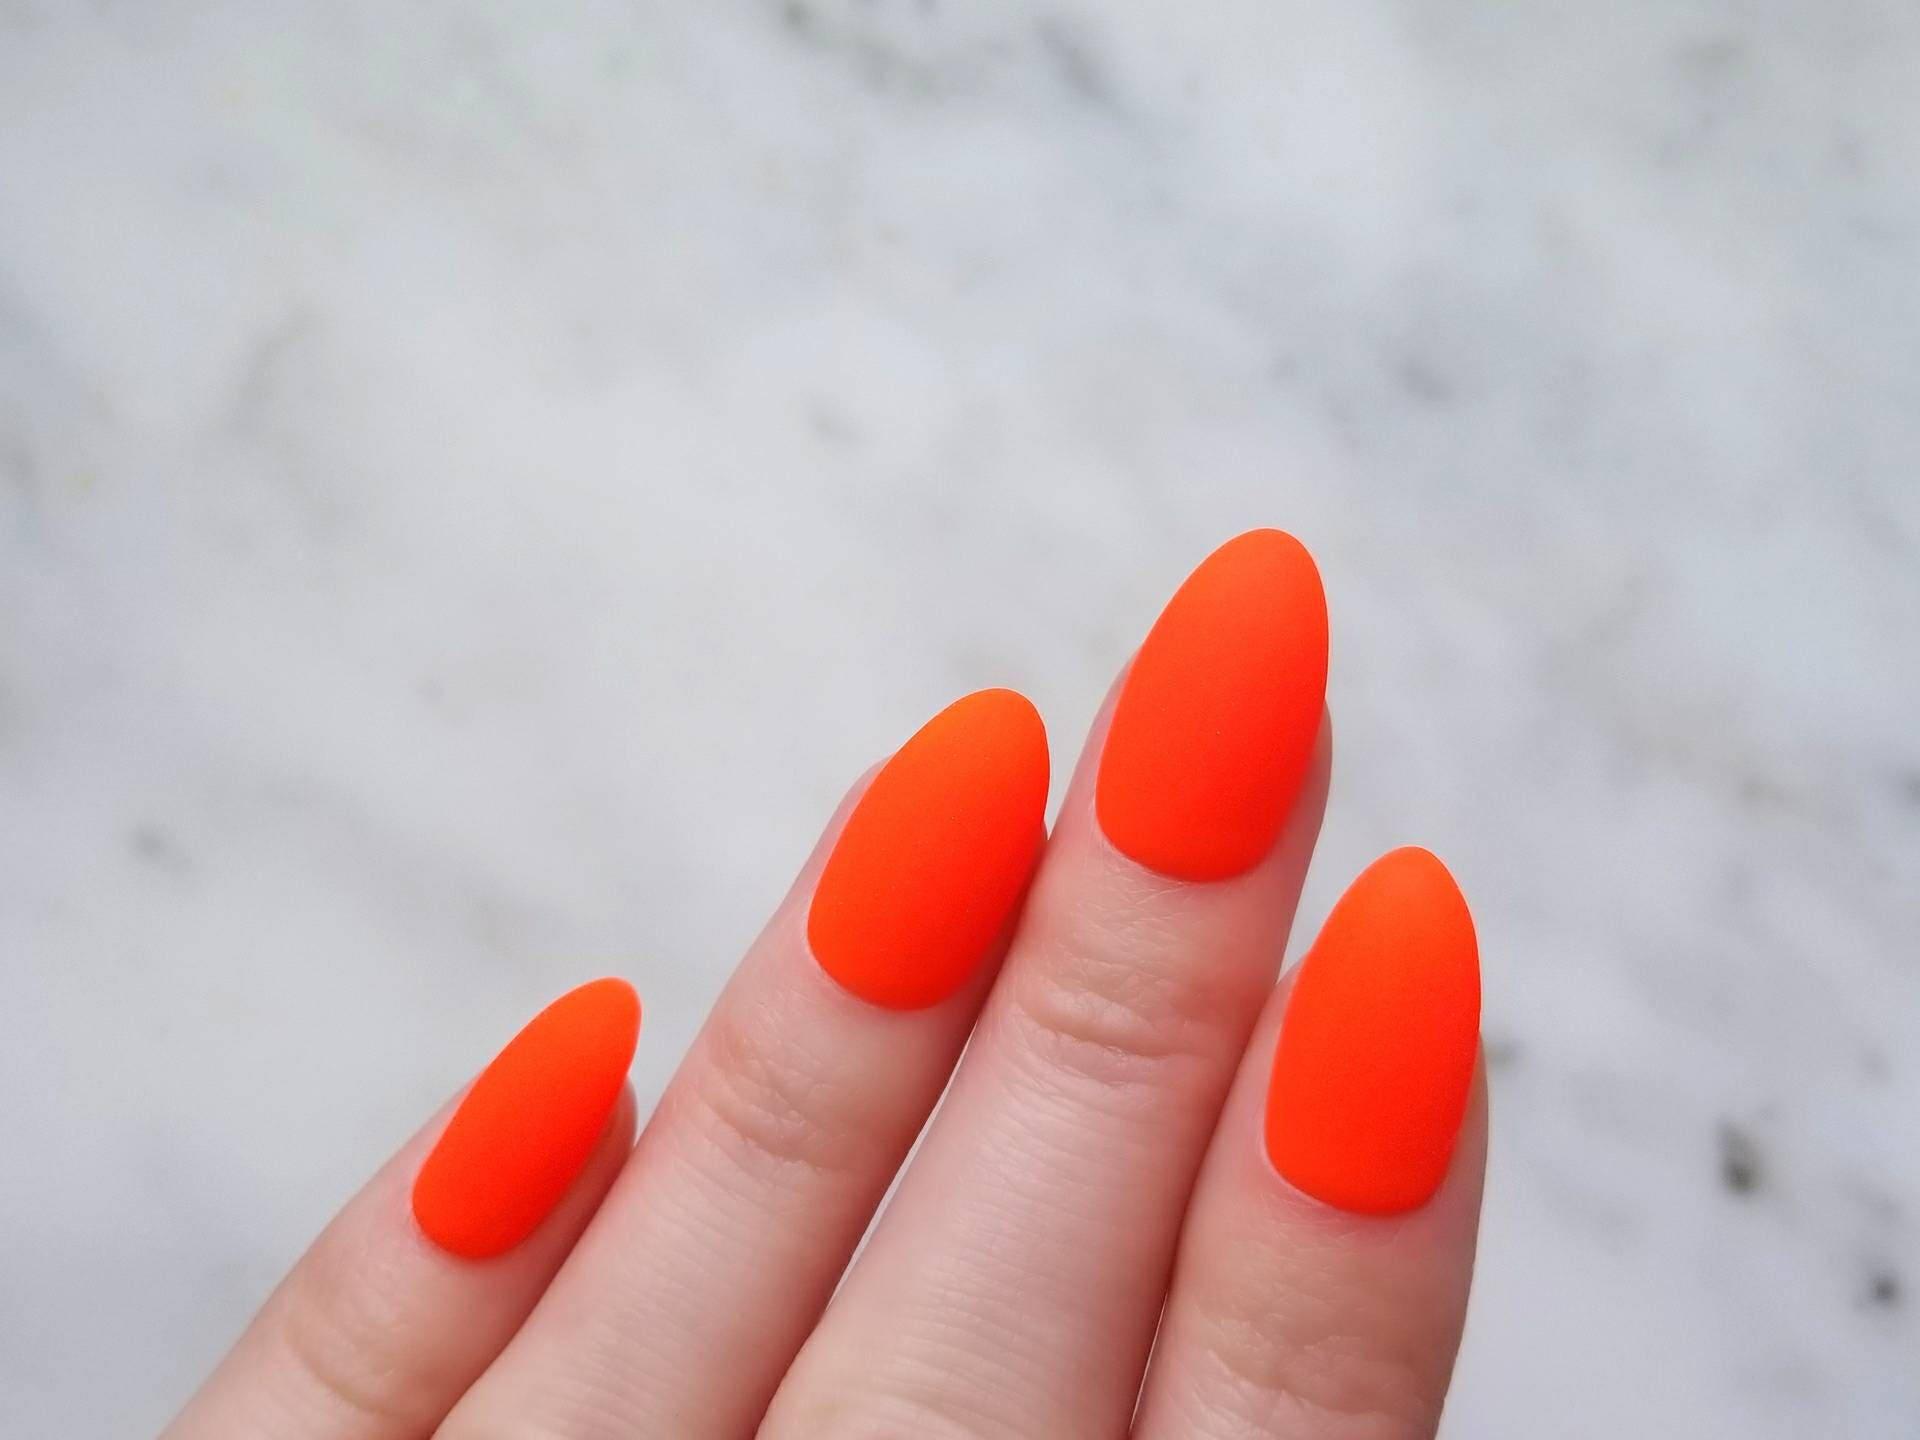 Prensa roja mate neón naranja en las uñas pintado a mano con